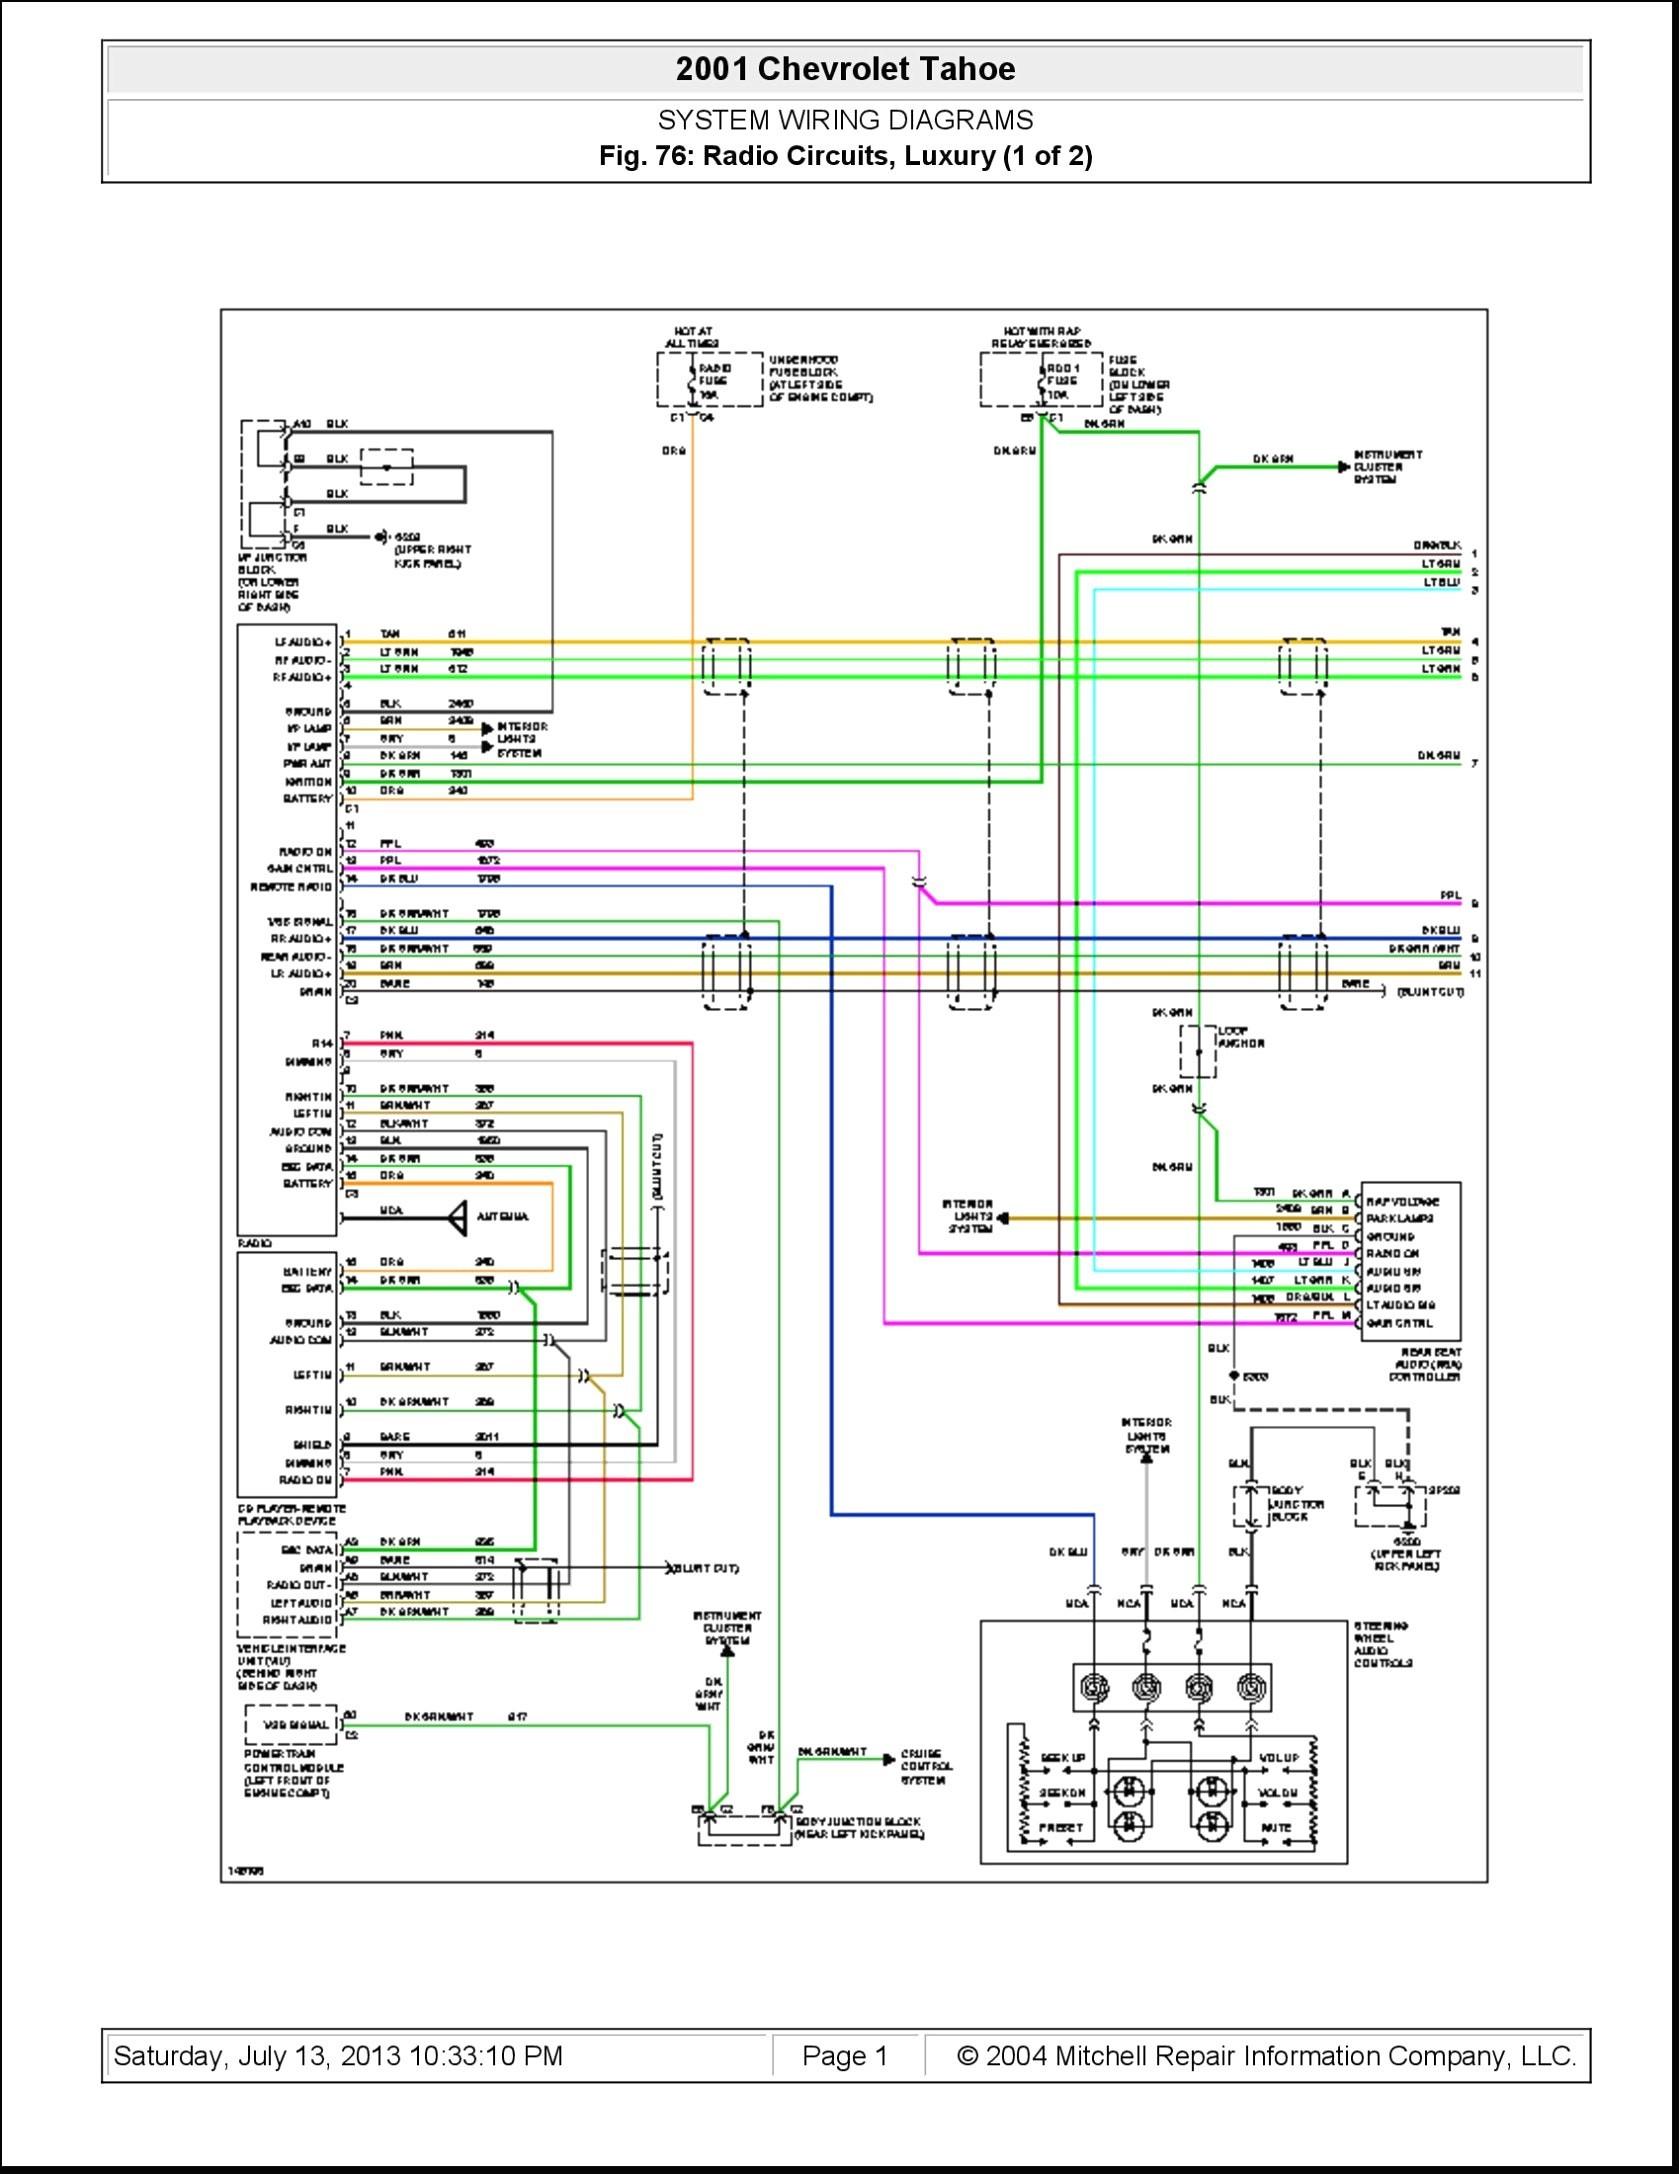 2004 Gmc Sierra Radio Wiring Harness Diagram Pics - Wiring ...